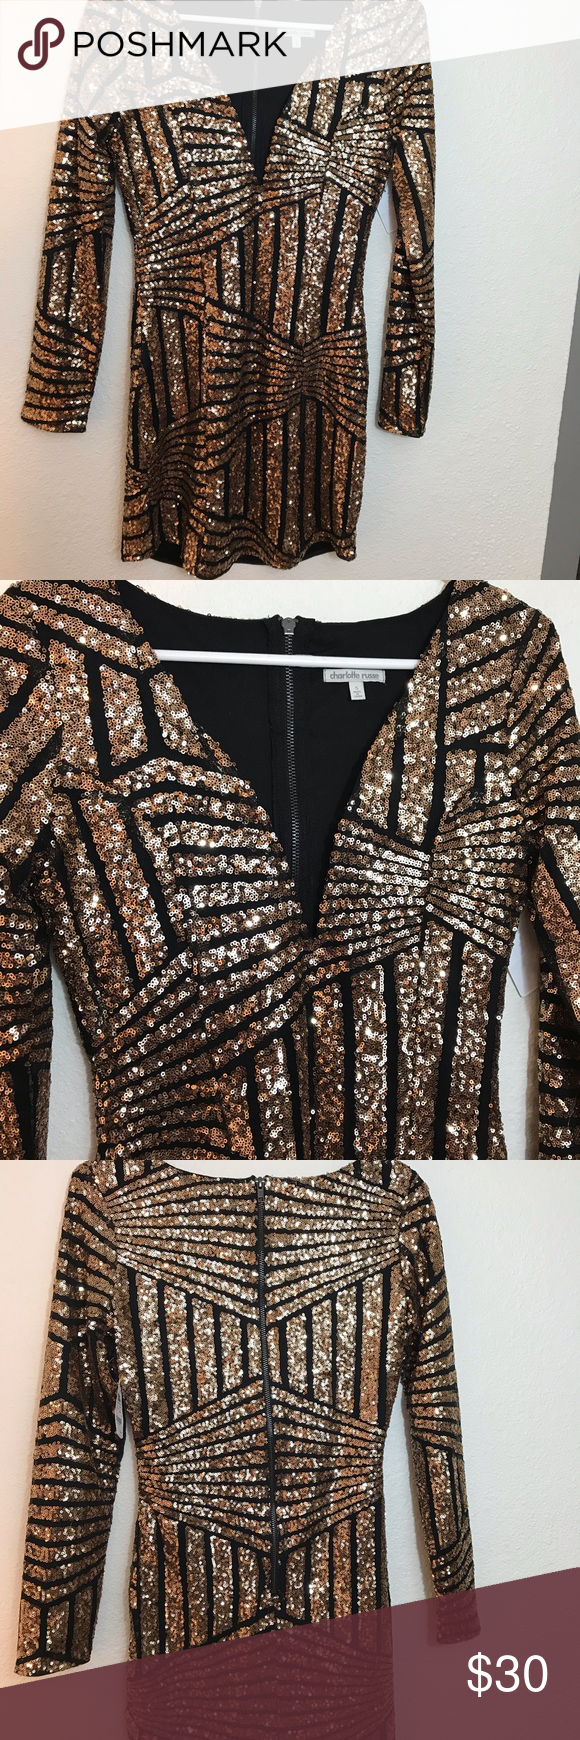 b03e6eb0159f6 NWT Charlotte Russe Black and Gold Sequin Dress Body con, V-neck, zipper in  back Charlotte Russe Dresses Mini